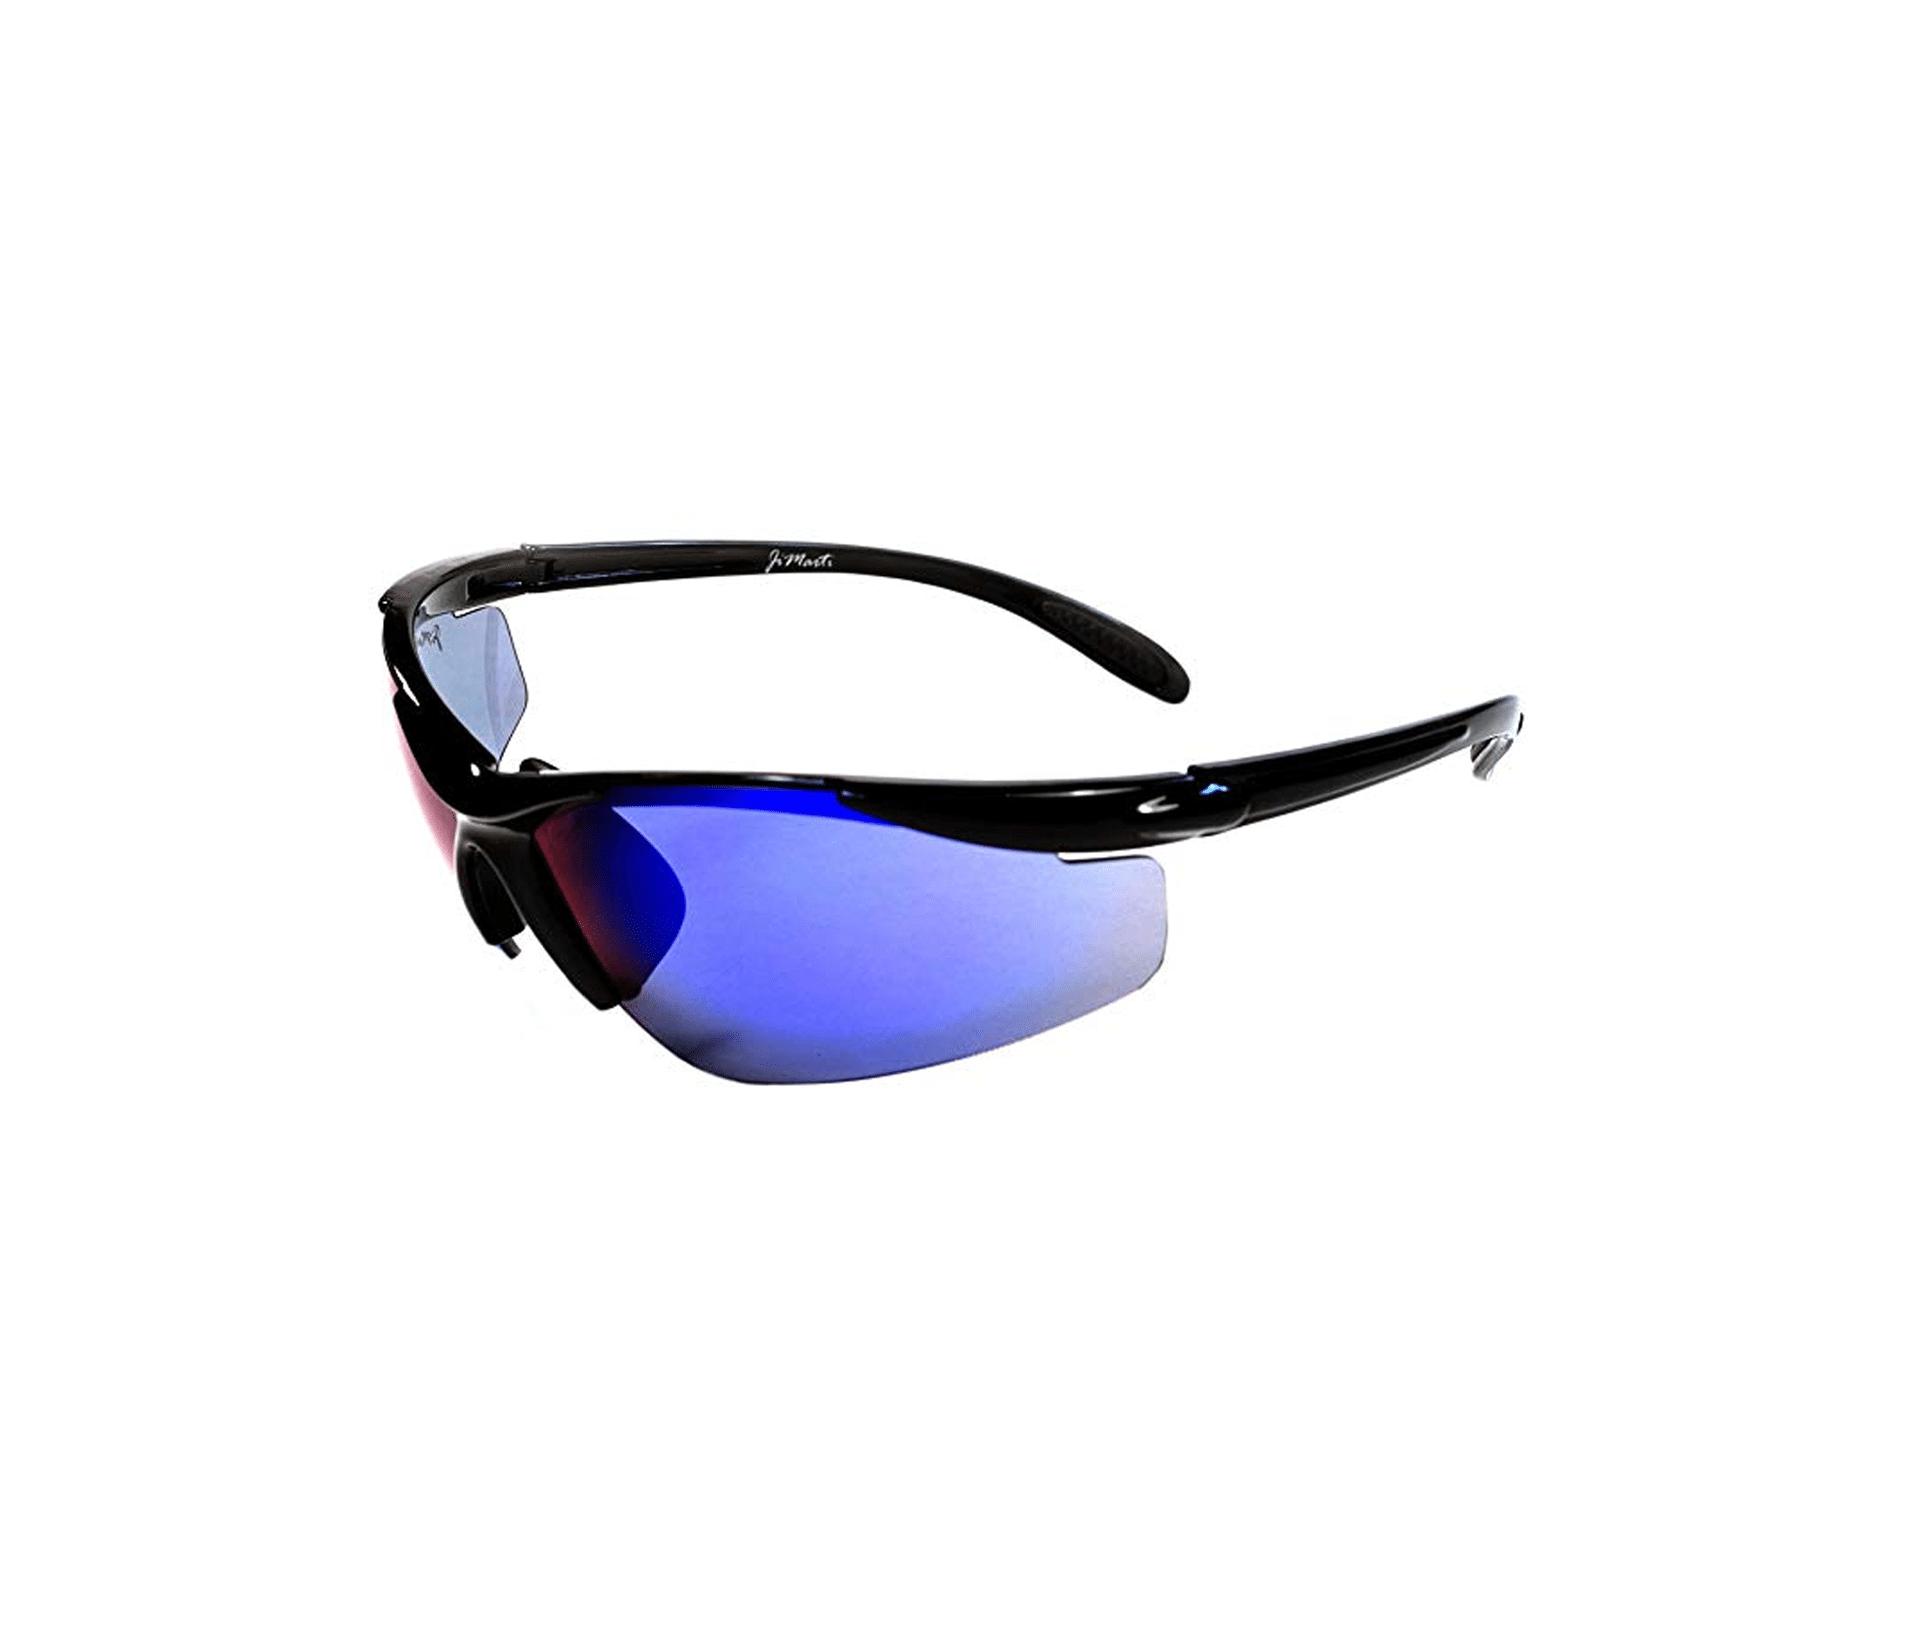 JiMarti JM01 Golf Sunglasses